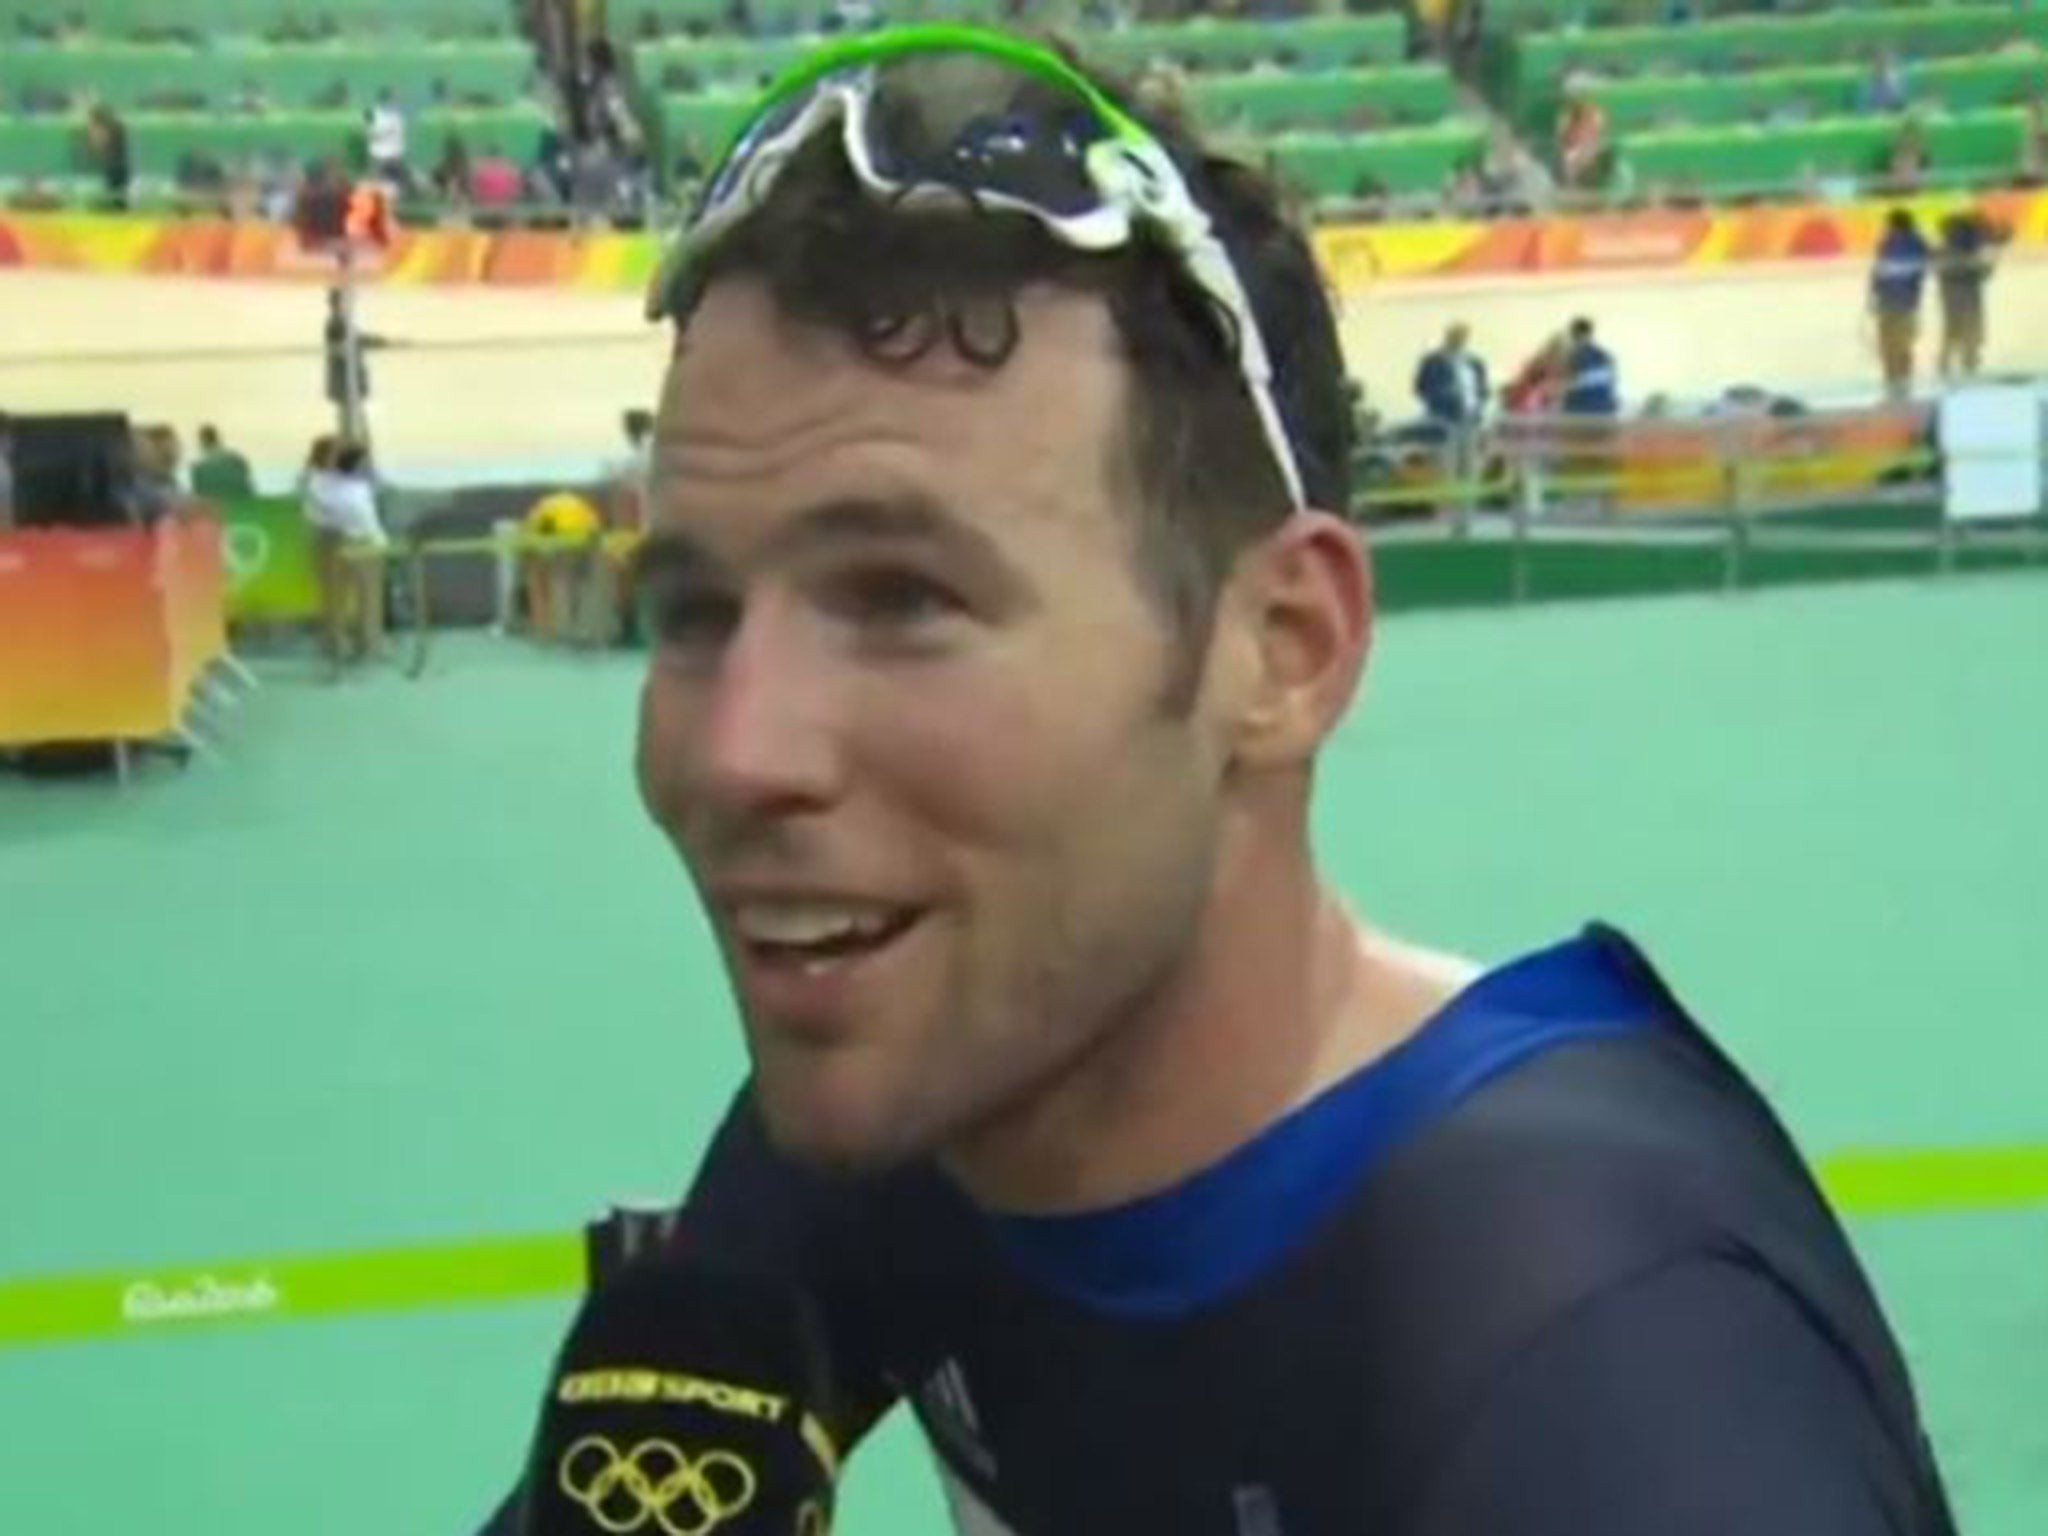 Rio 2016 Mark Cavendish Makes Bradley Wiggins Joke